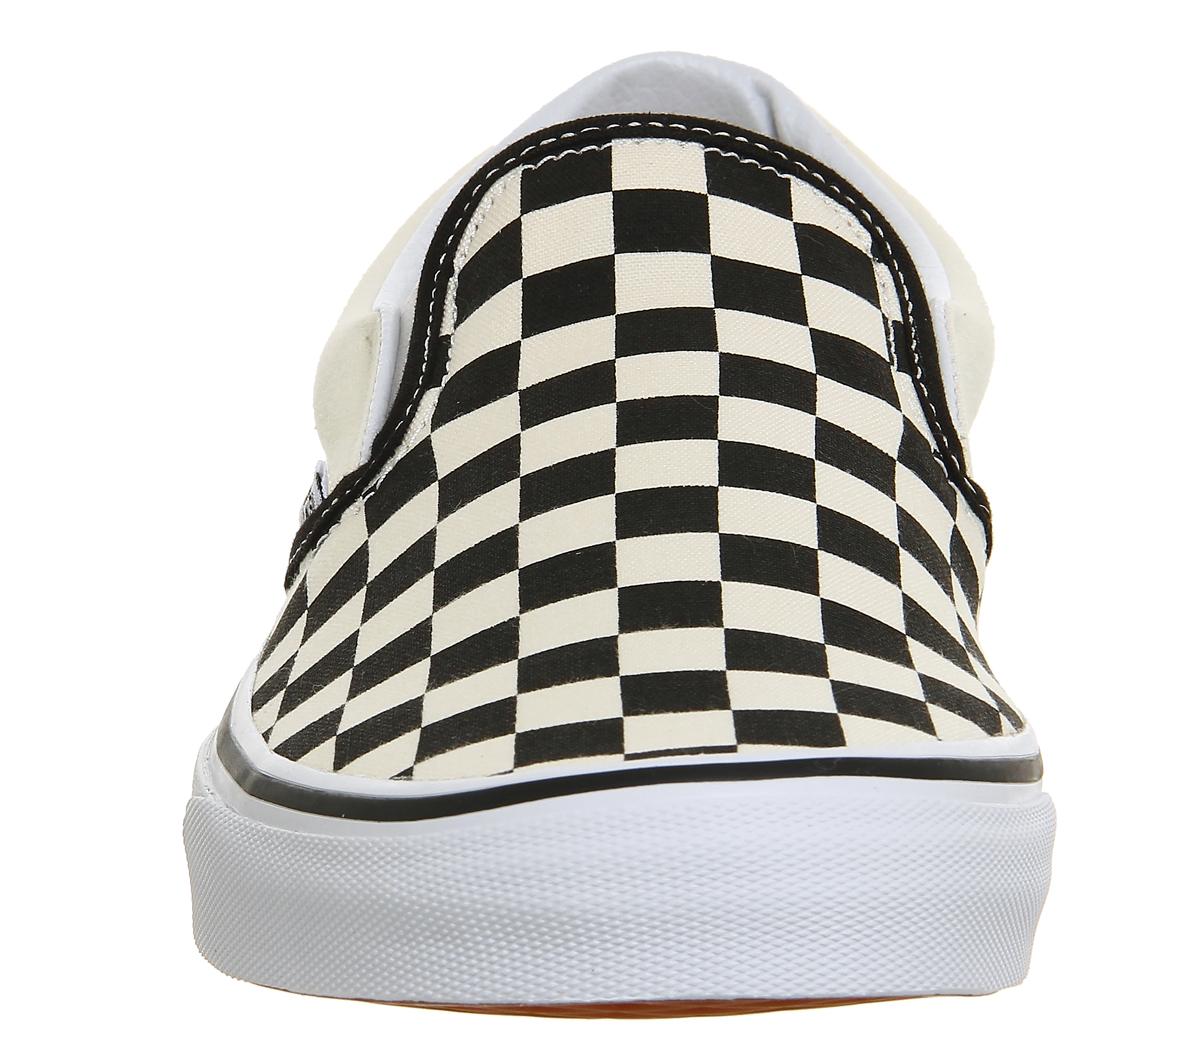 1200x1049 Vans Classic Slip On Shoes Black White Check